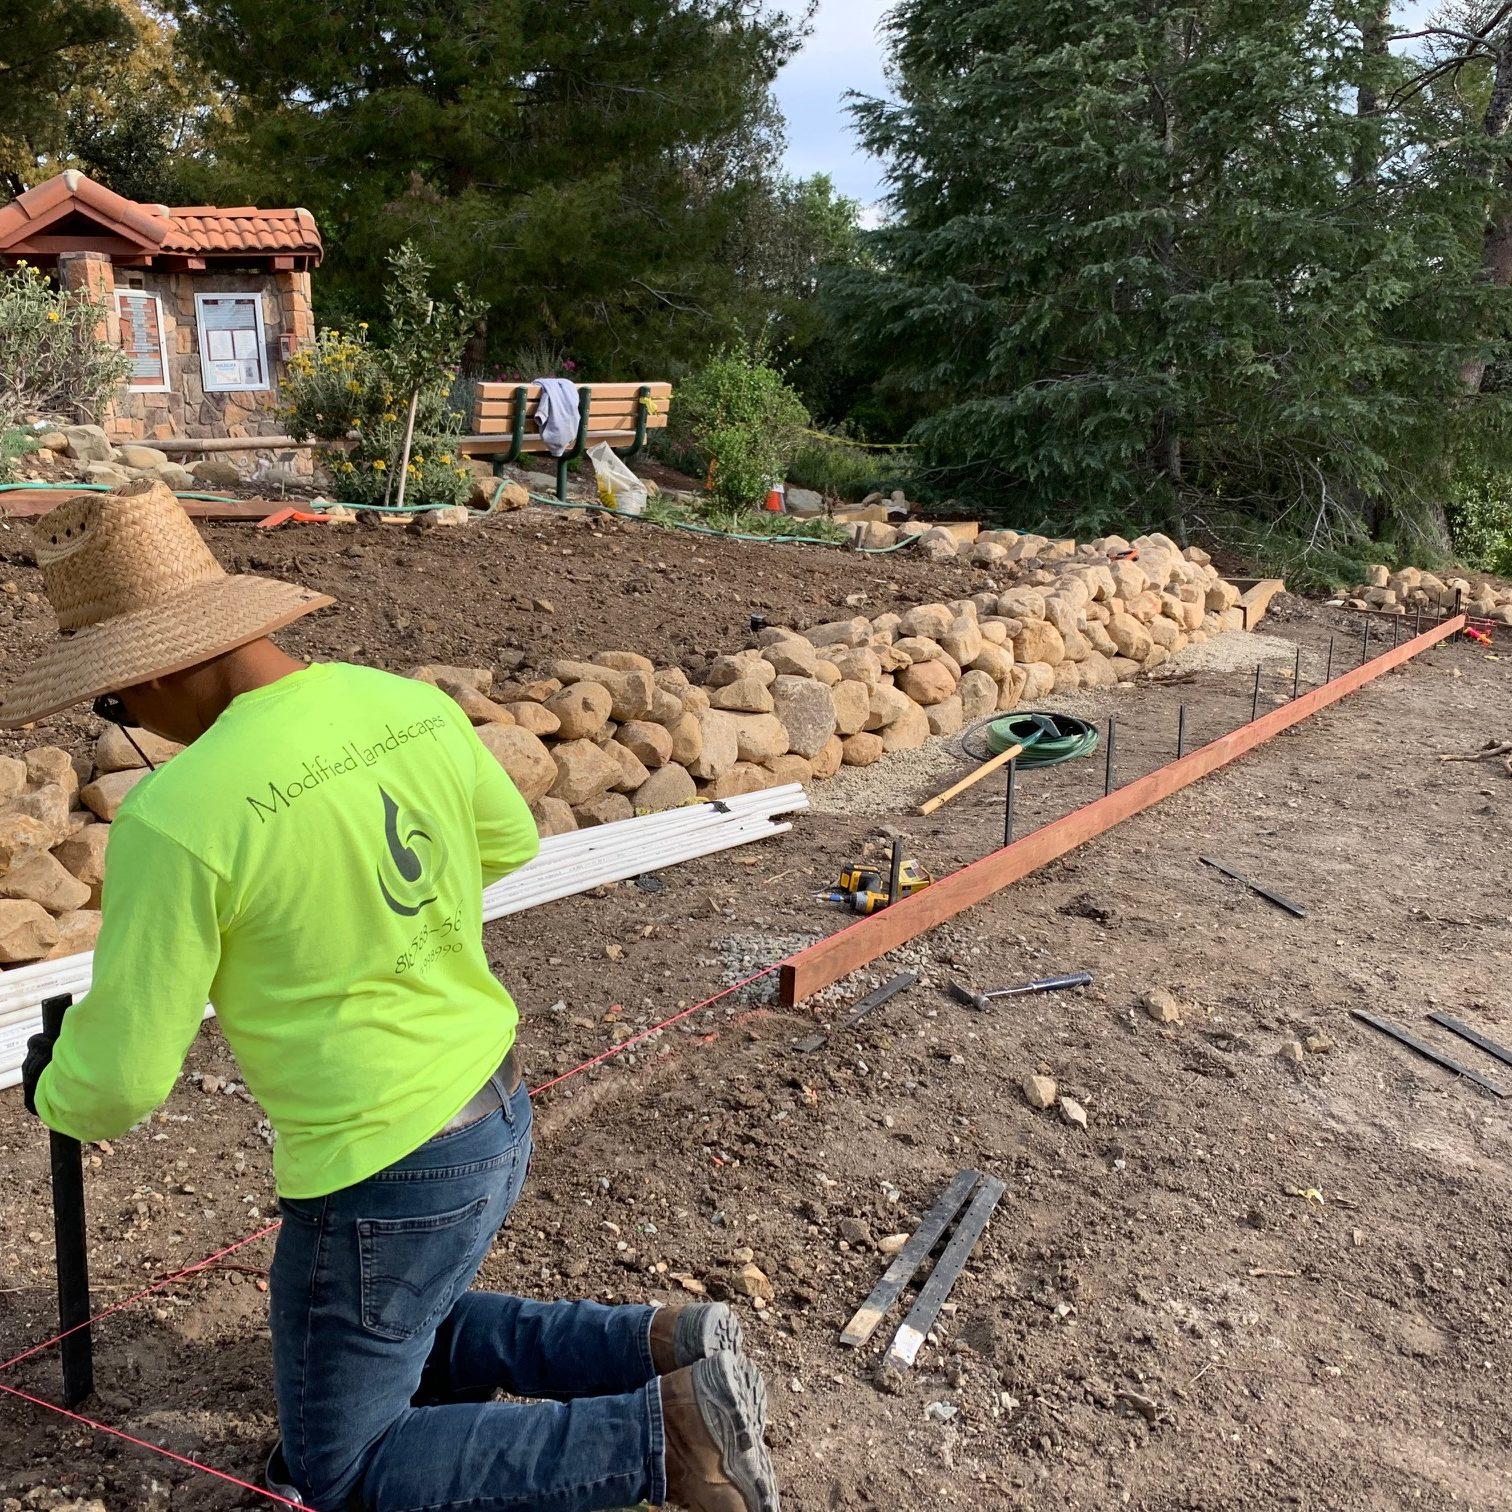 la-canada-california-landscaping-jobs